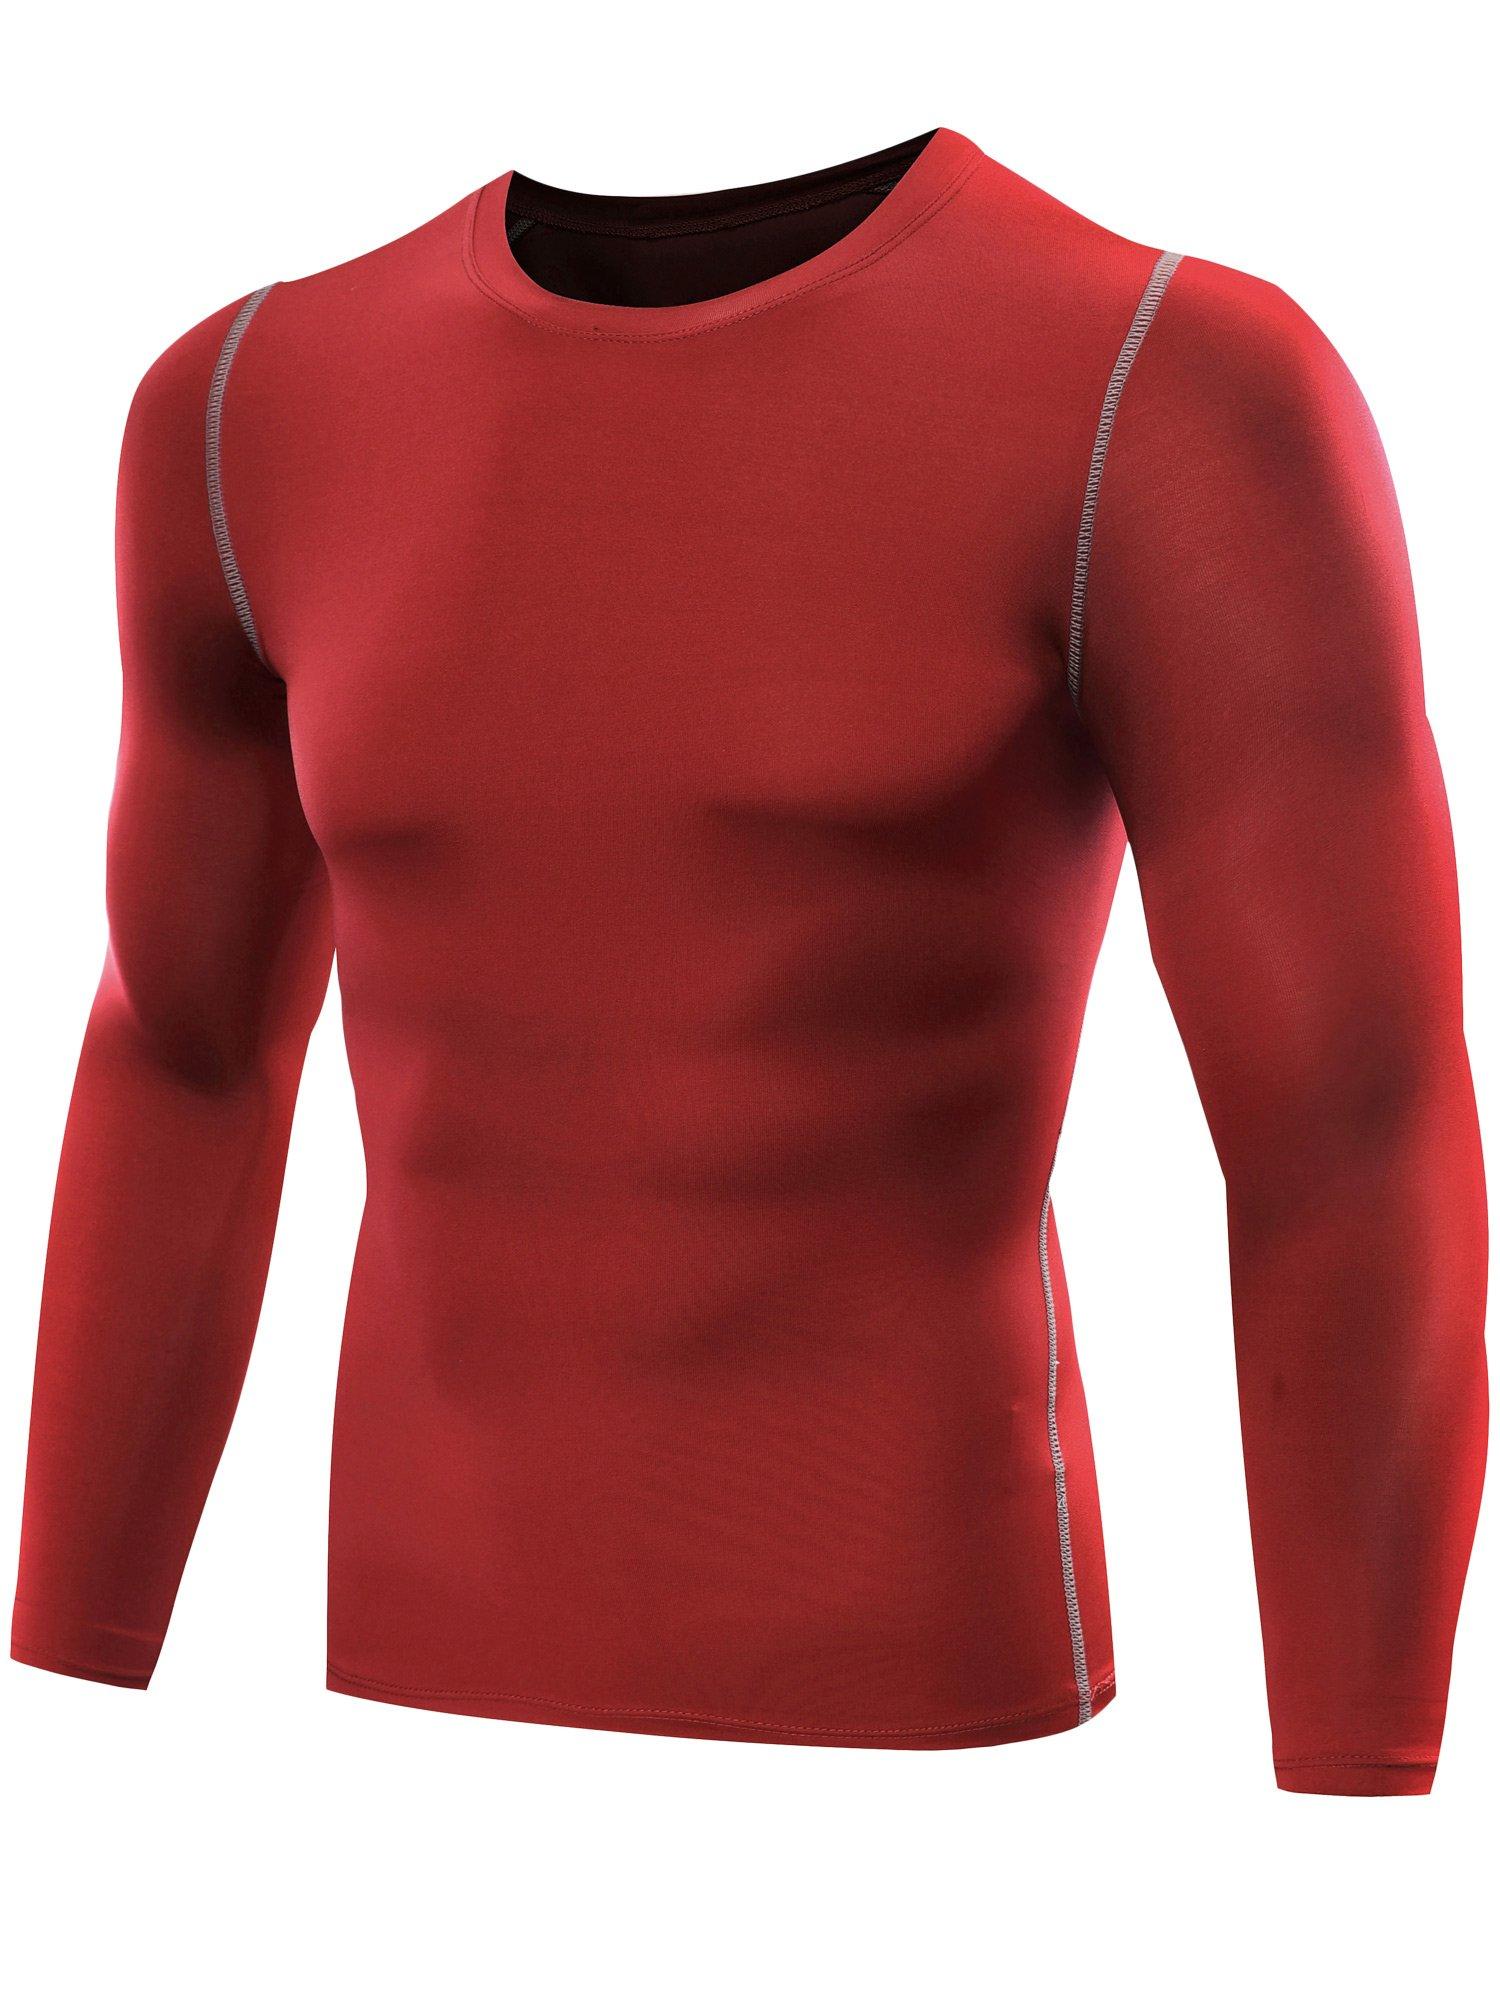 df70b438f79b Galleon - Neleus Men's 3 Pack Athletic Compression Sport Running T Shirt  Long Sleeve Base Layer,Grey,Blue,Red,Medium